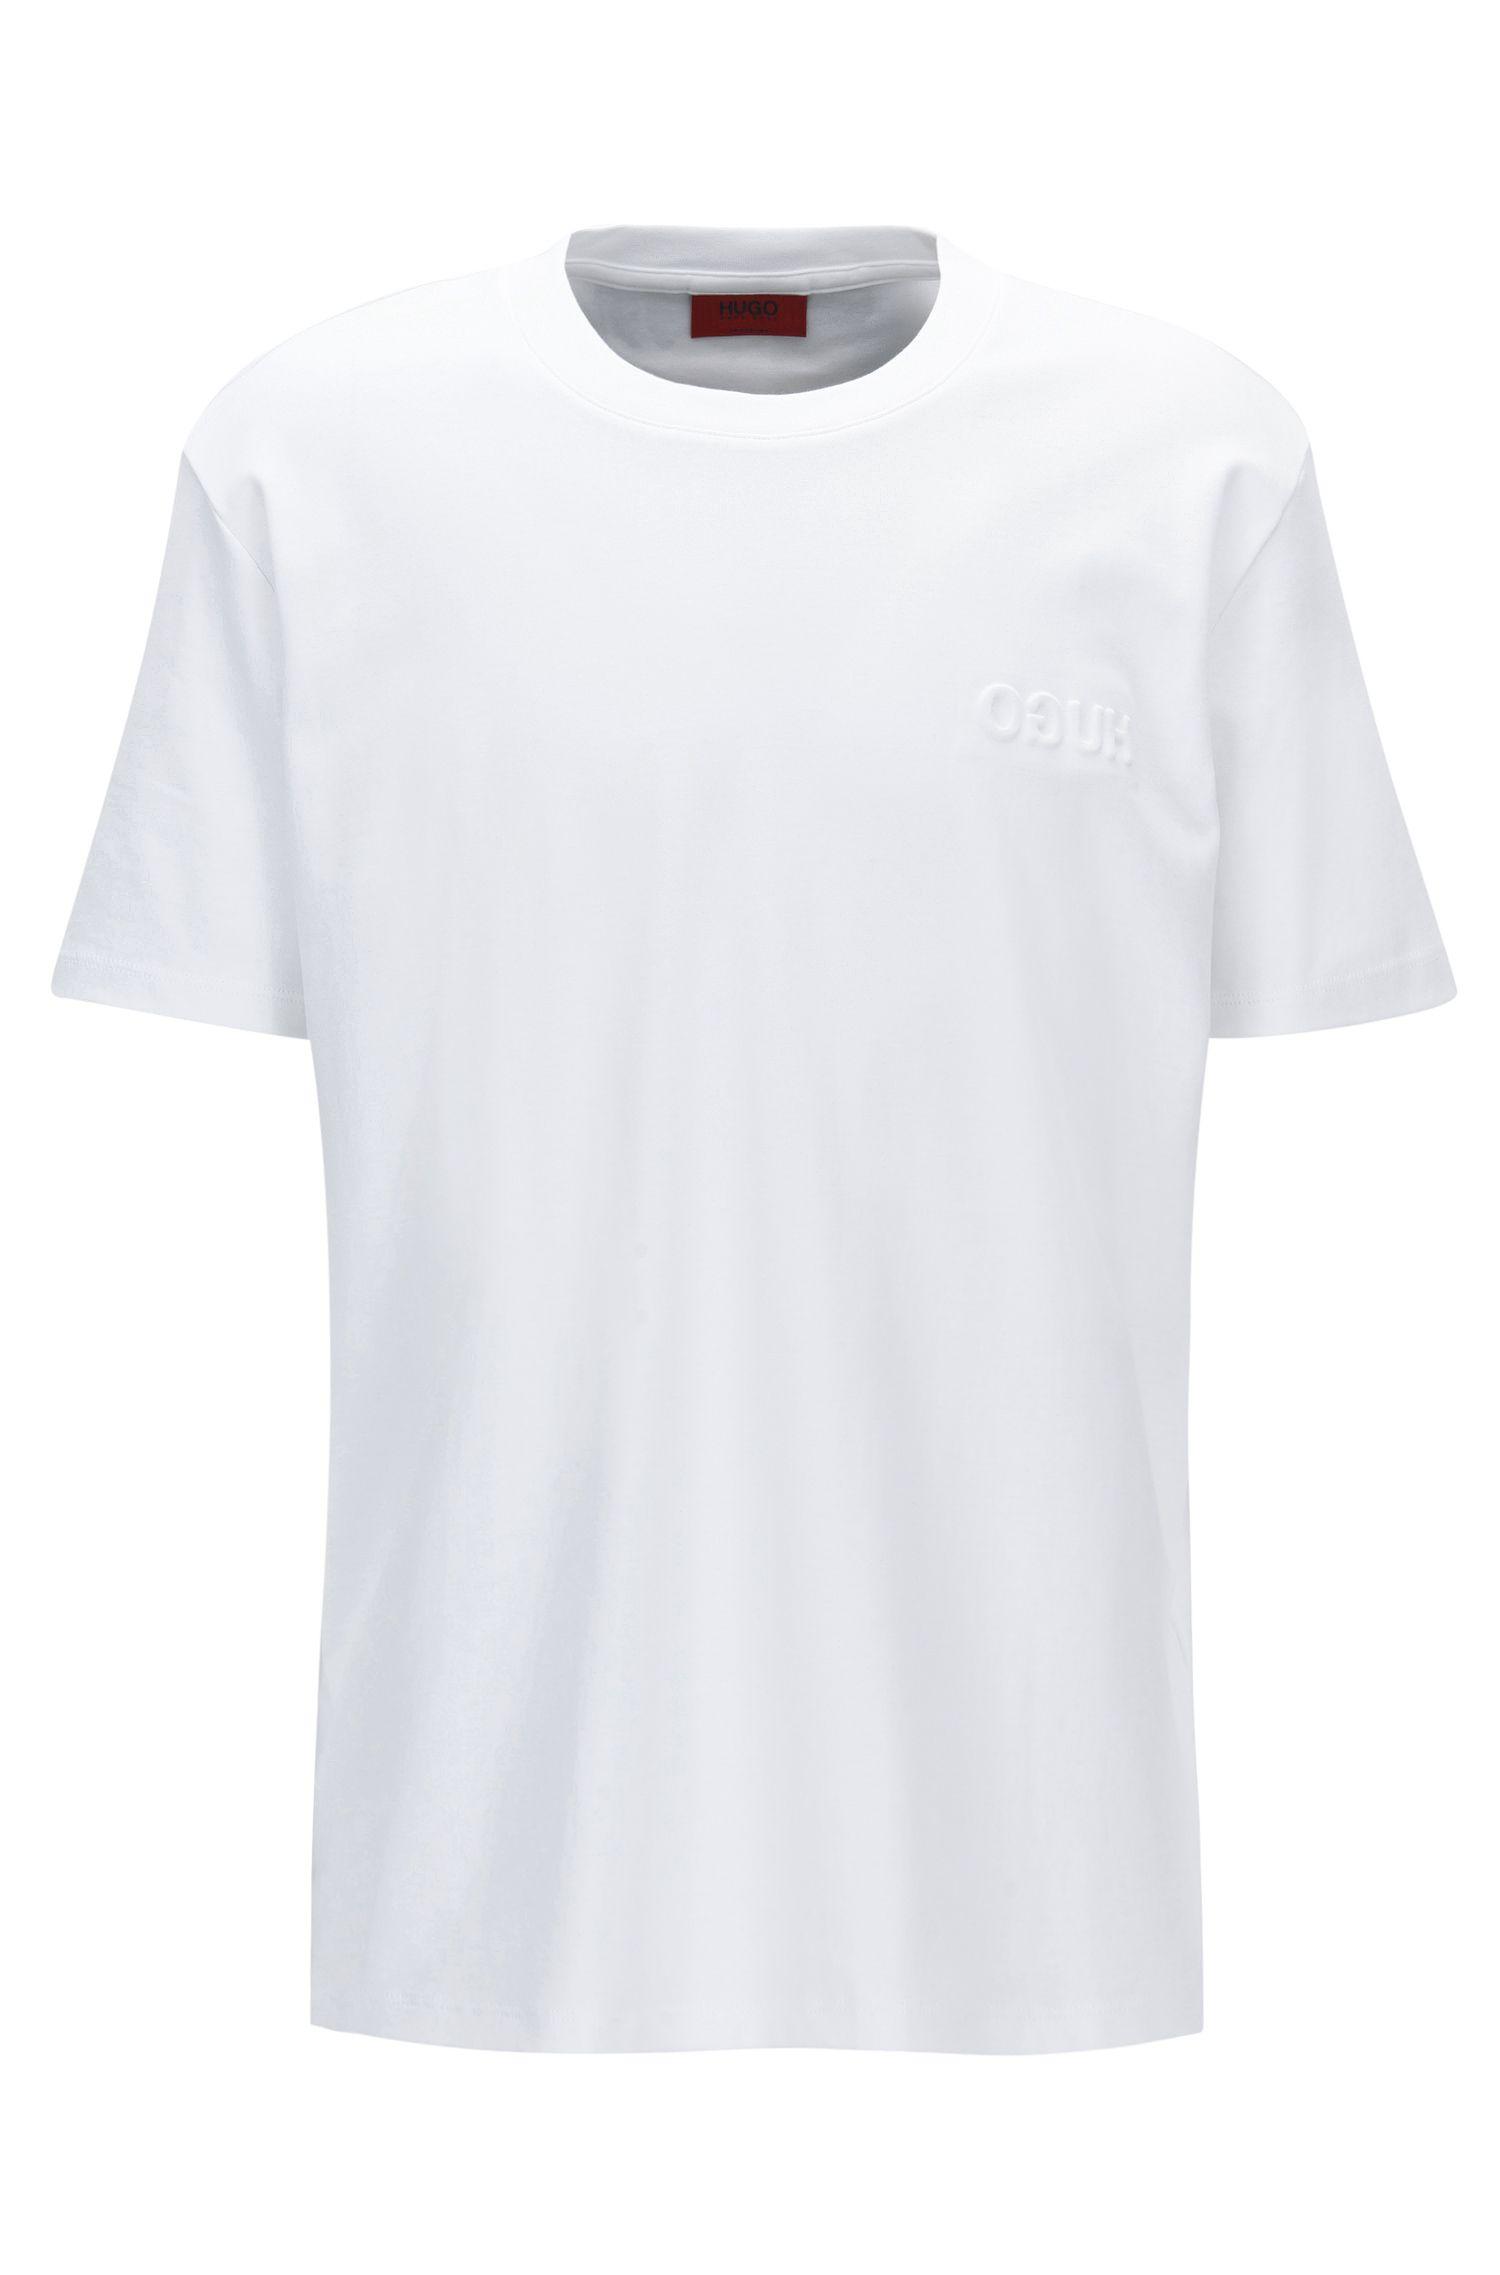 T-shirt oversize in cotone Pima